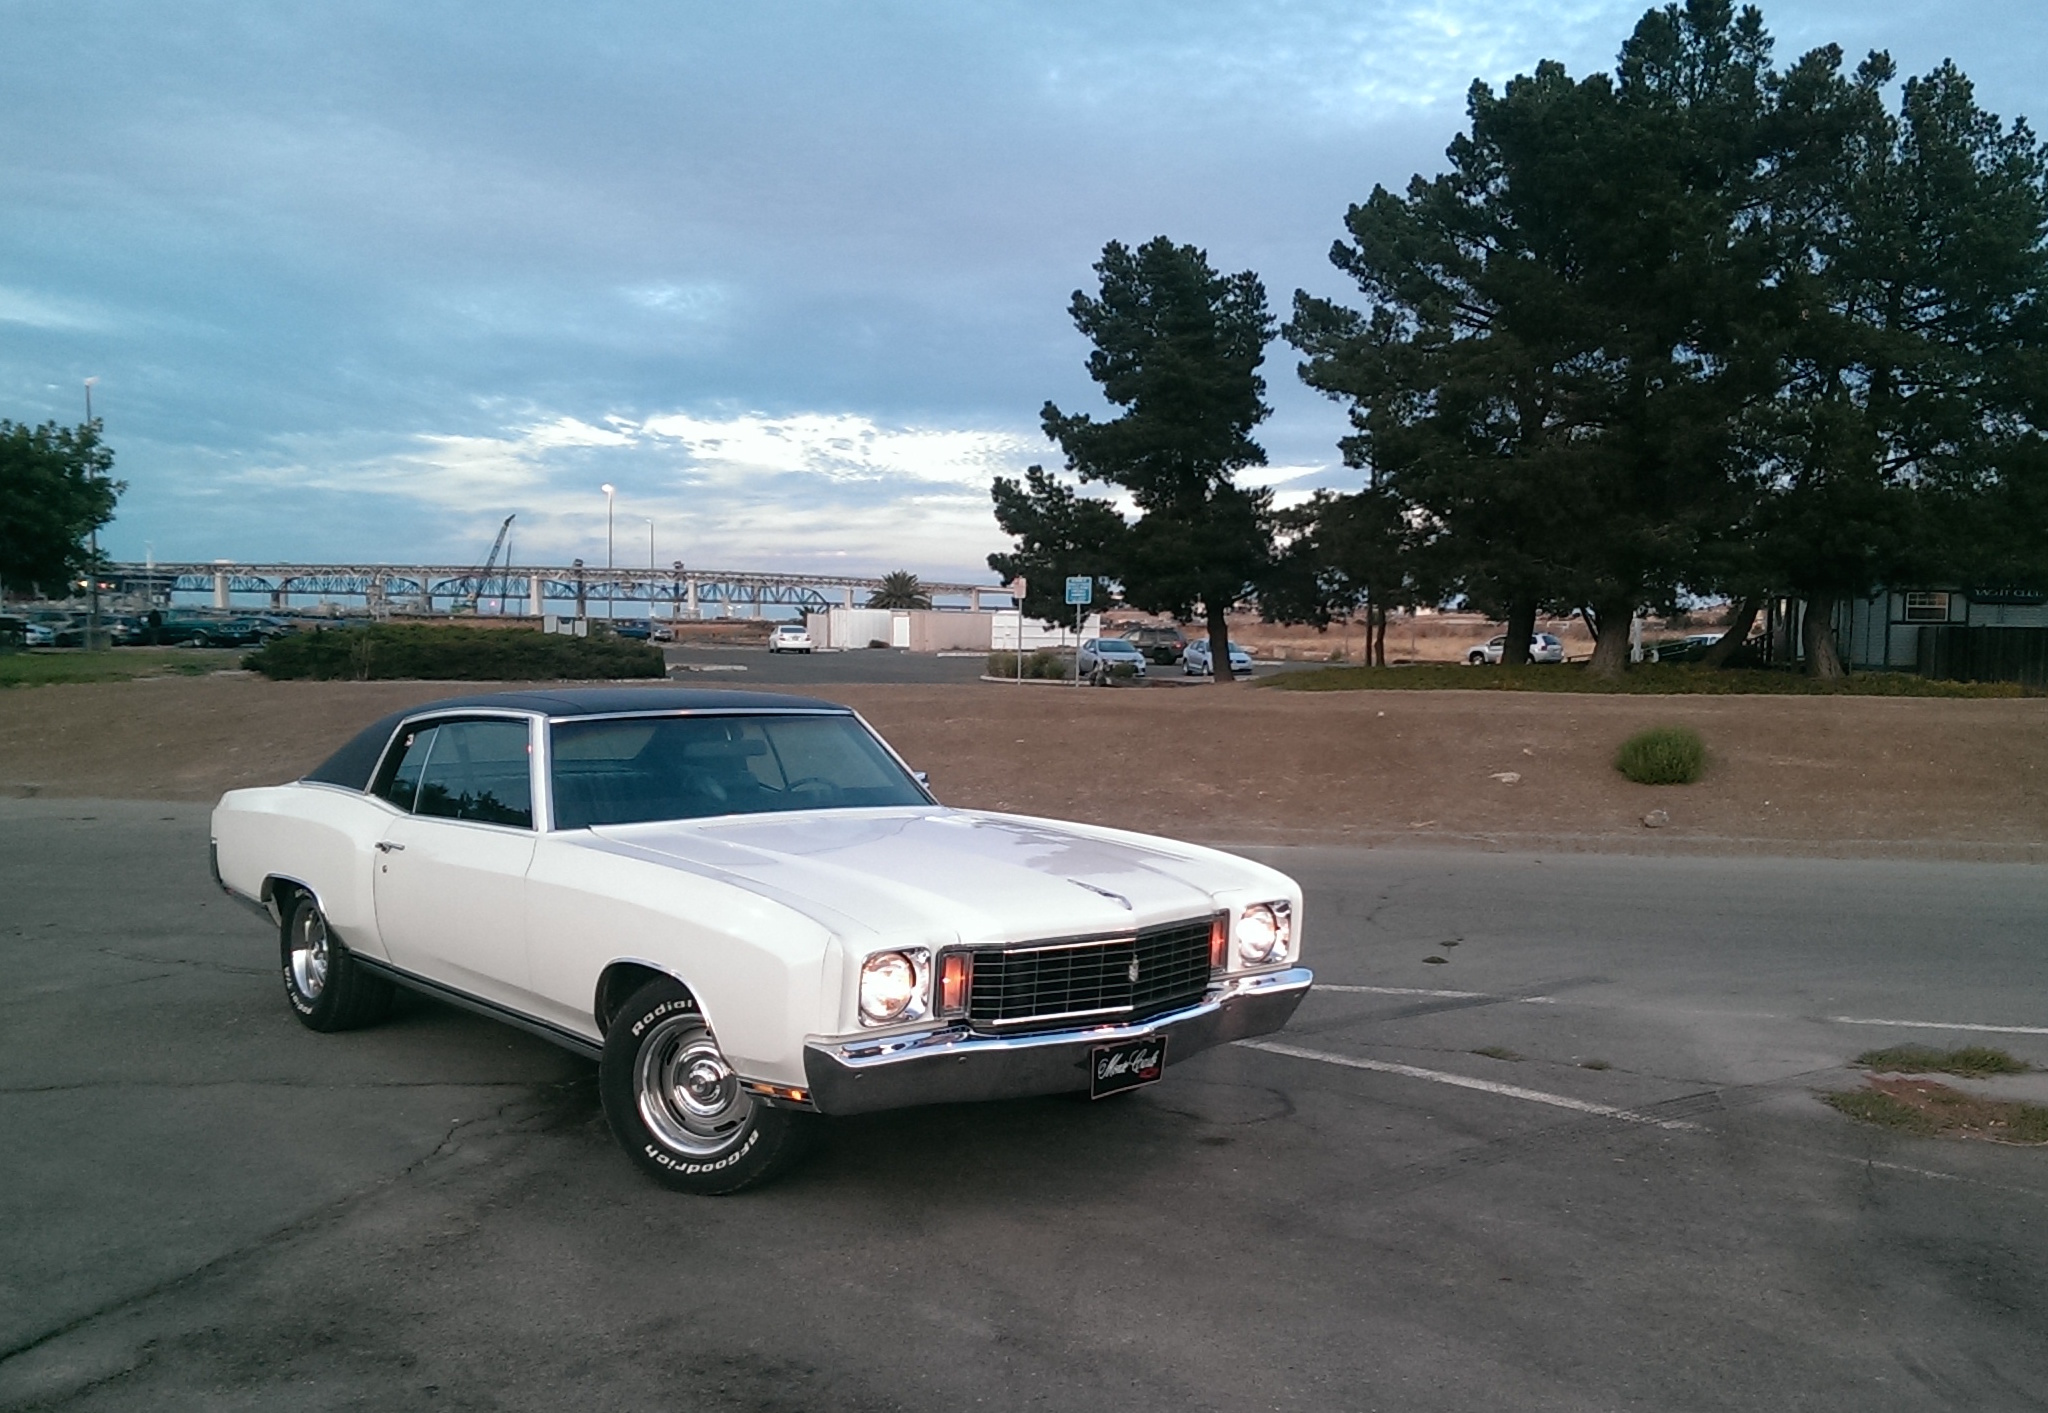 1970 Chevrolet Monte Carlo 3/4 front